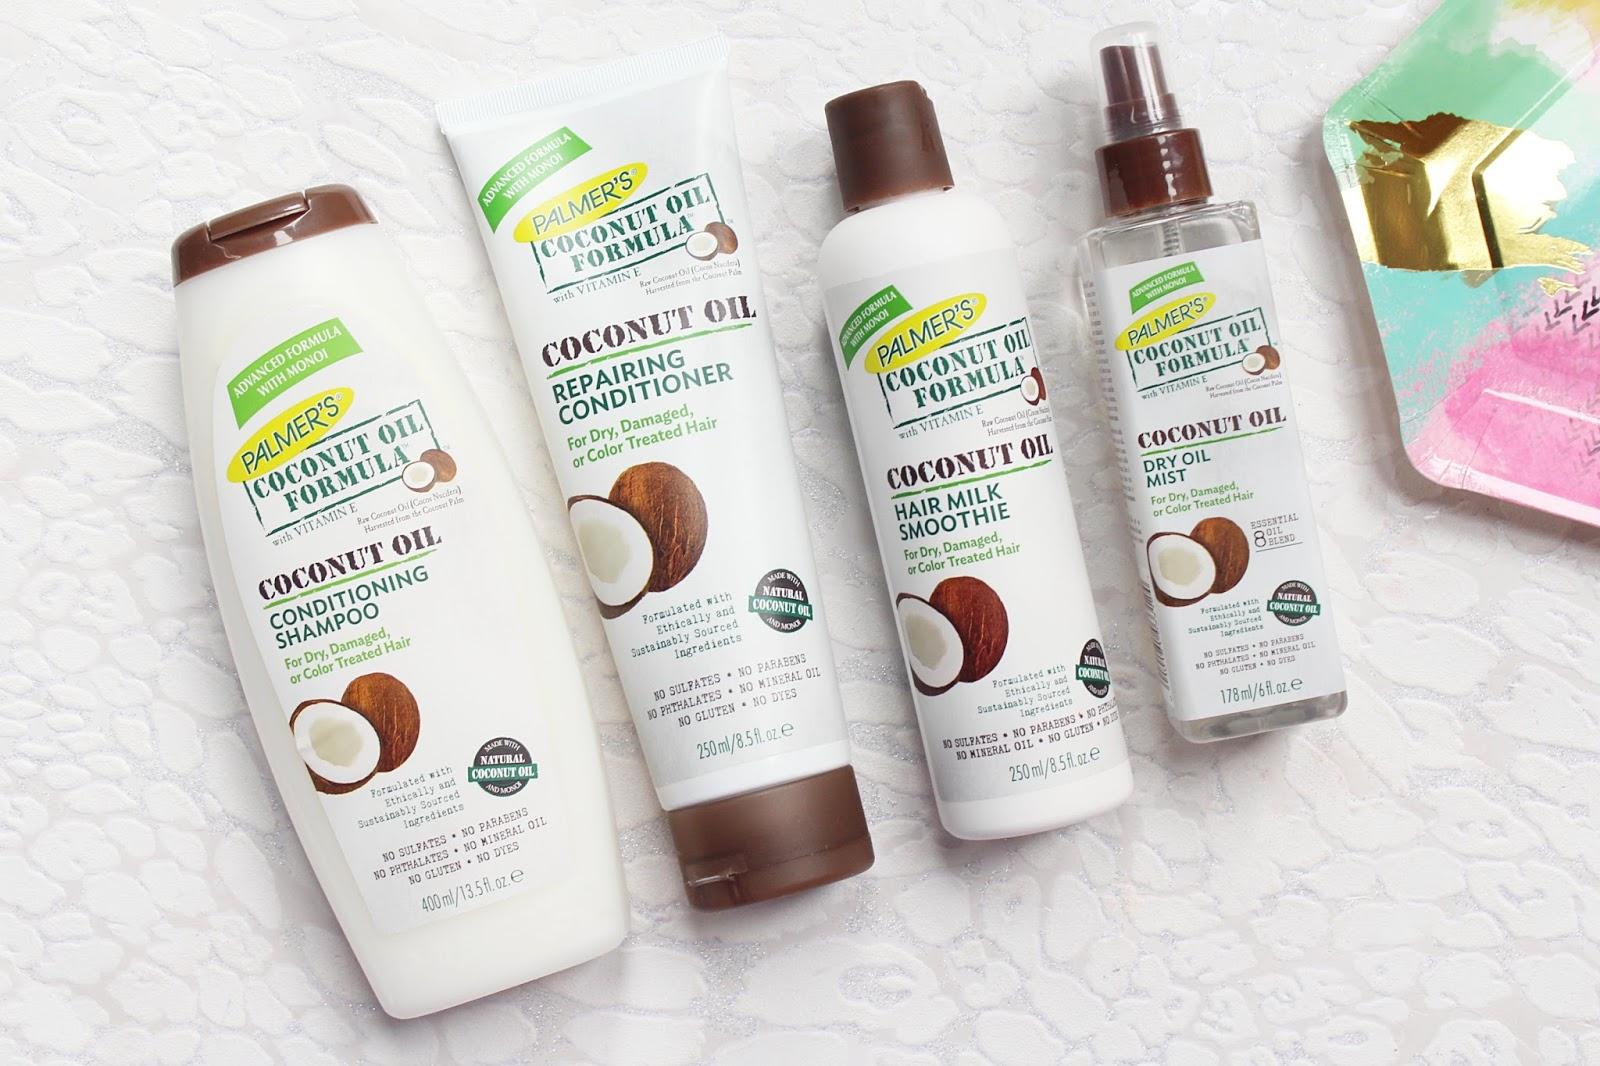 Palmers Coconut Oil Hair Care